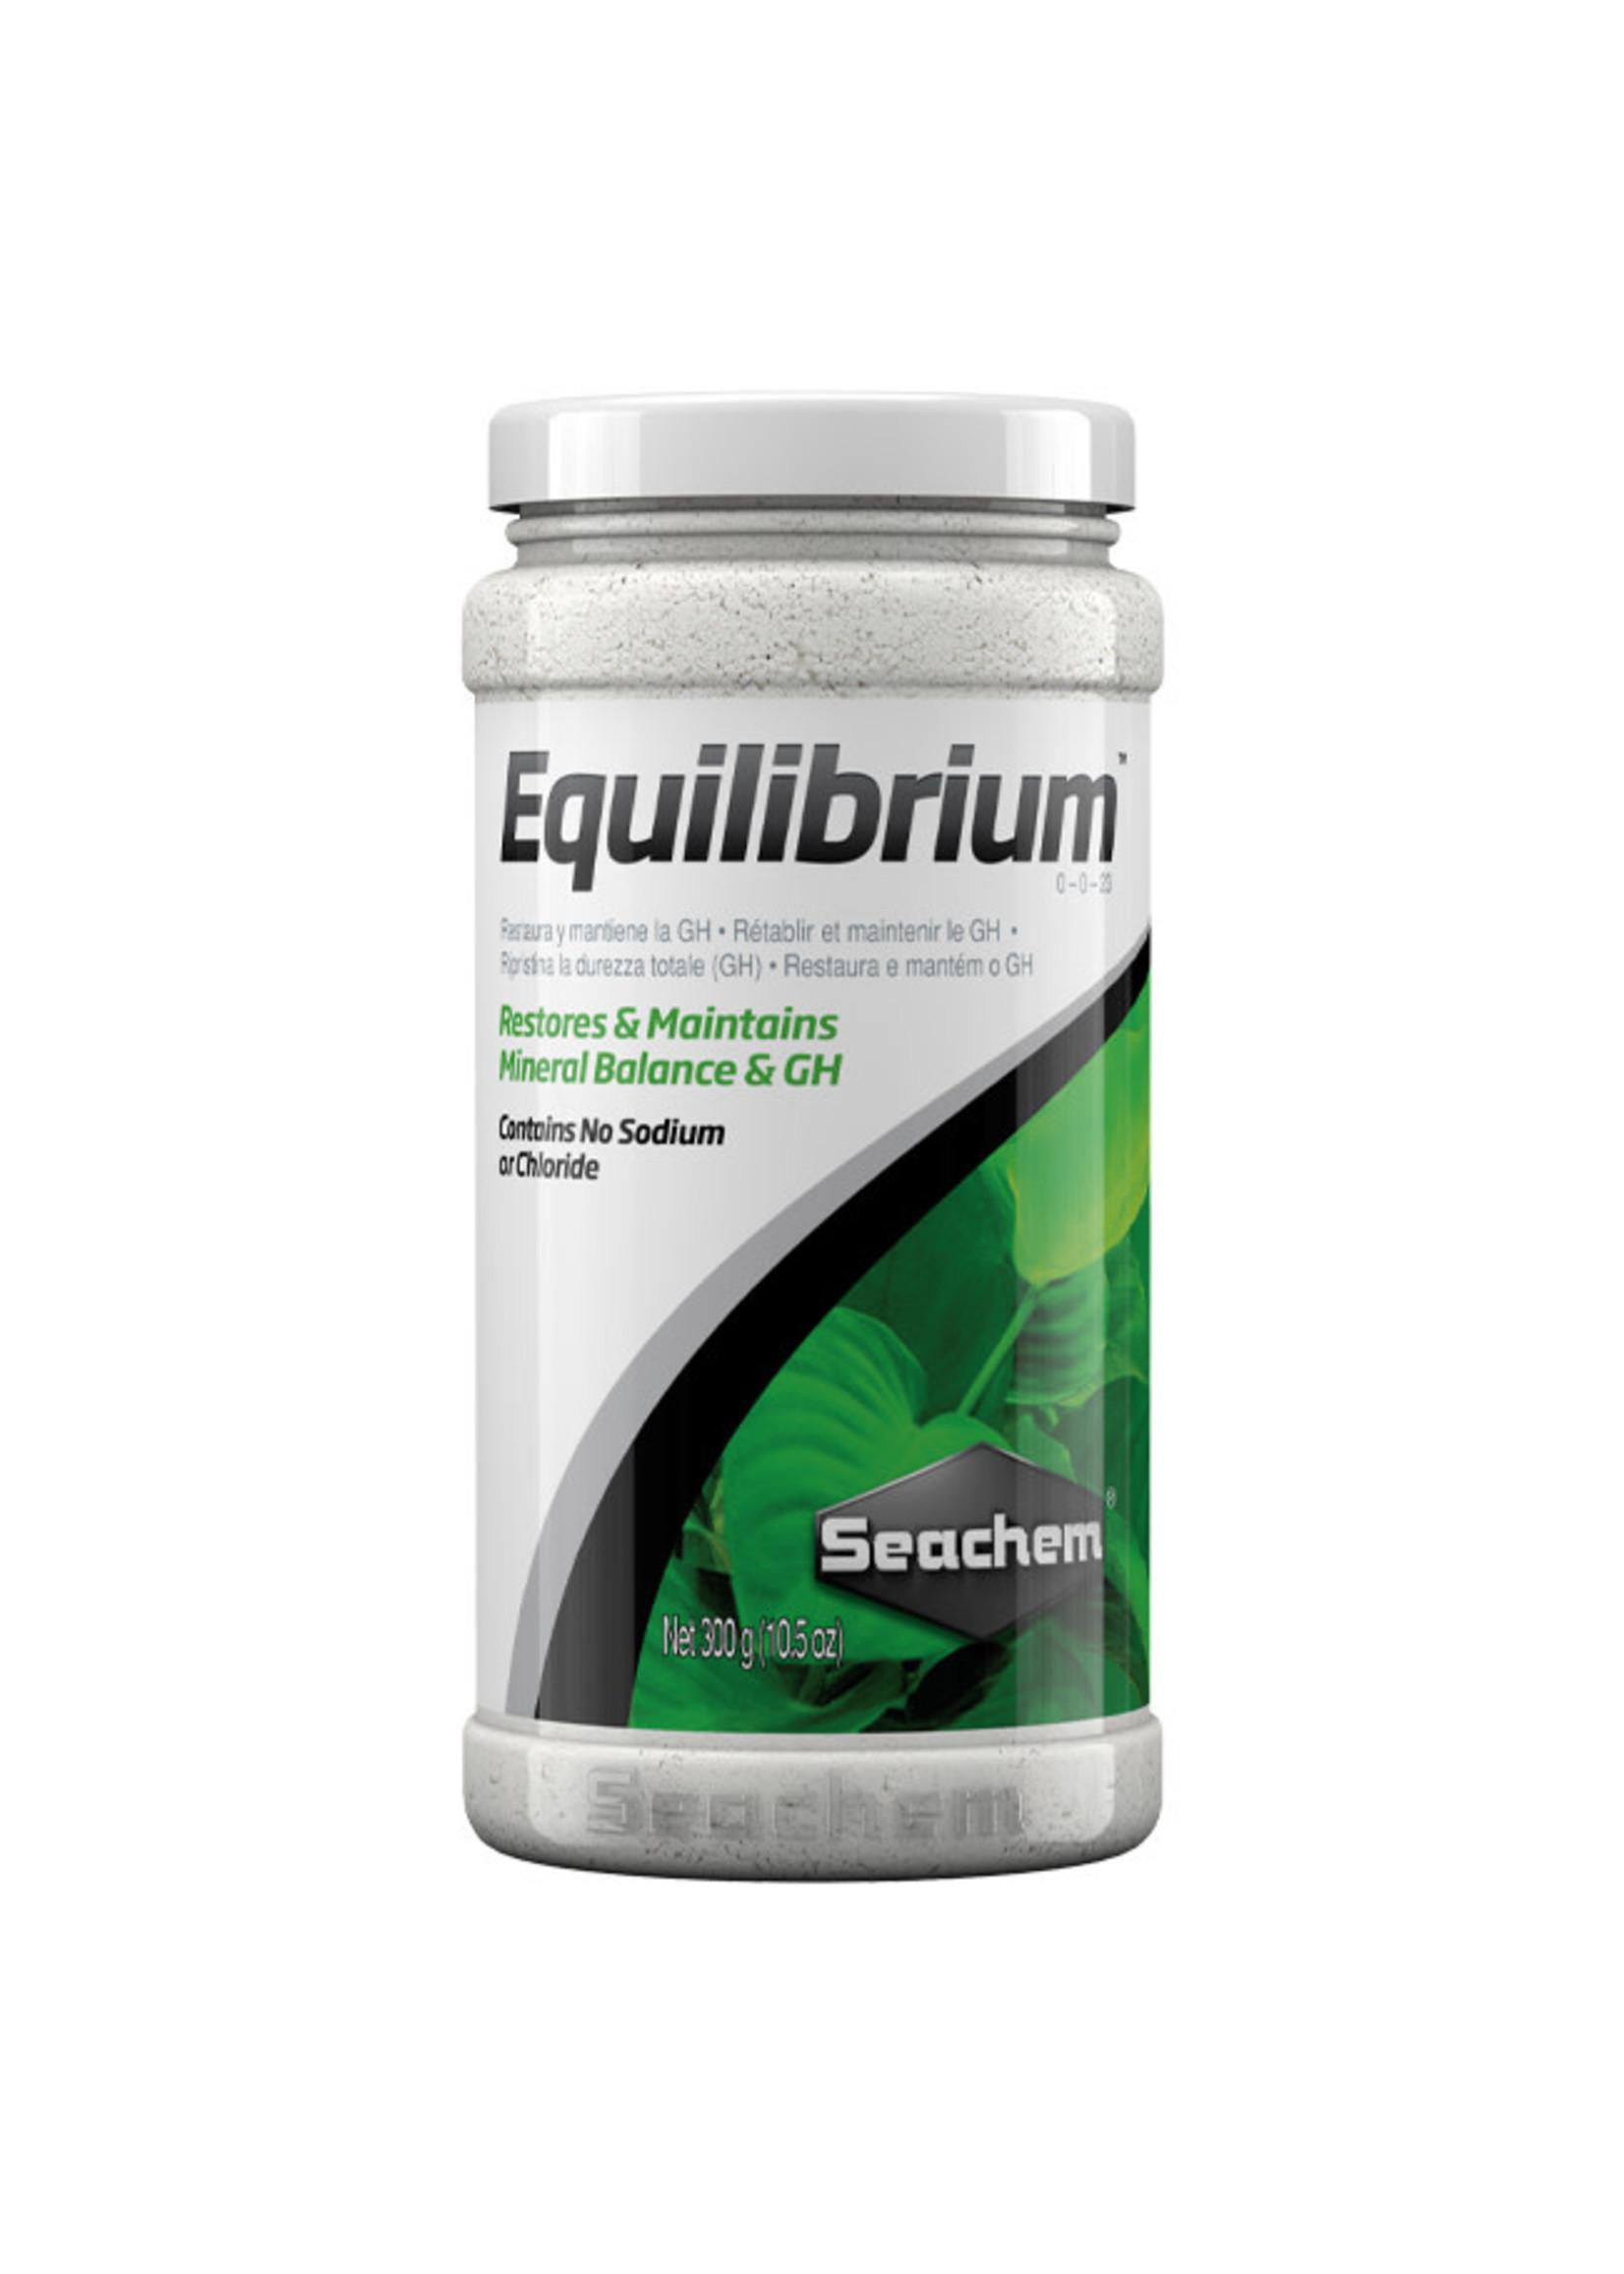 Seachem Laboratories, Inc. Seachem Equilibrium 300g / 10.5oz